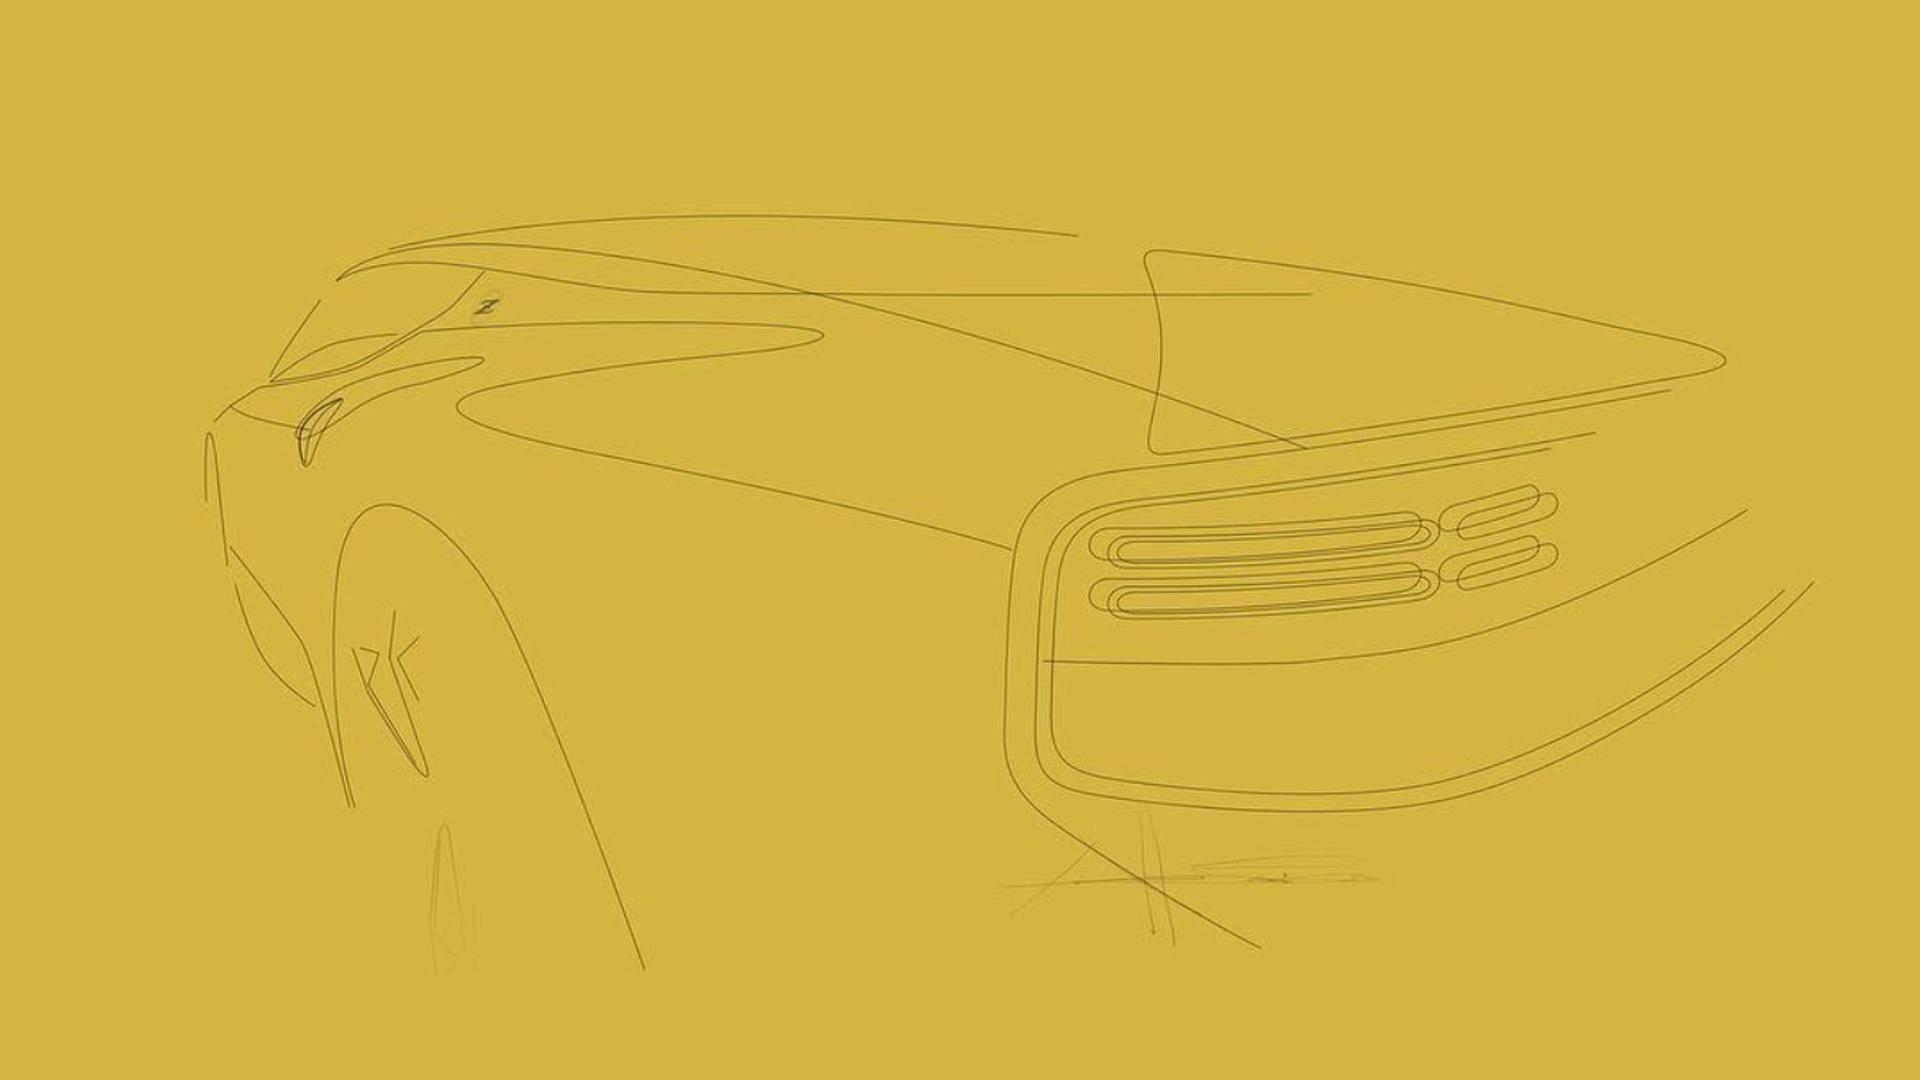 Teaser for Z35 Nissan Z sports car